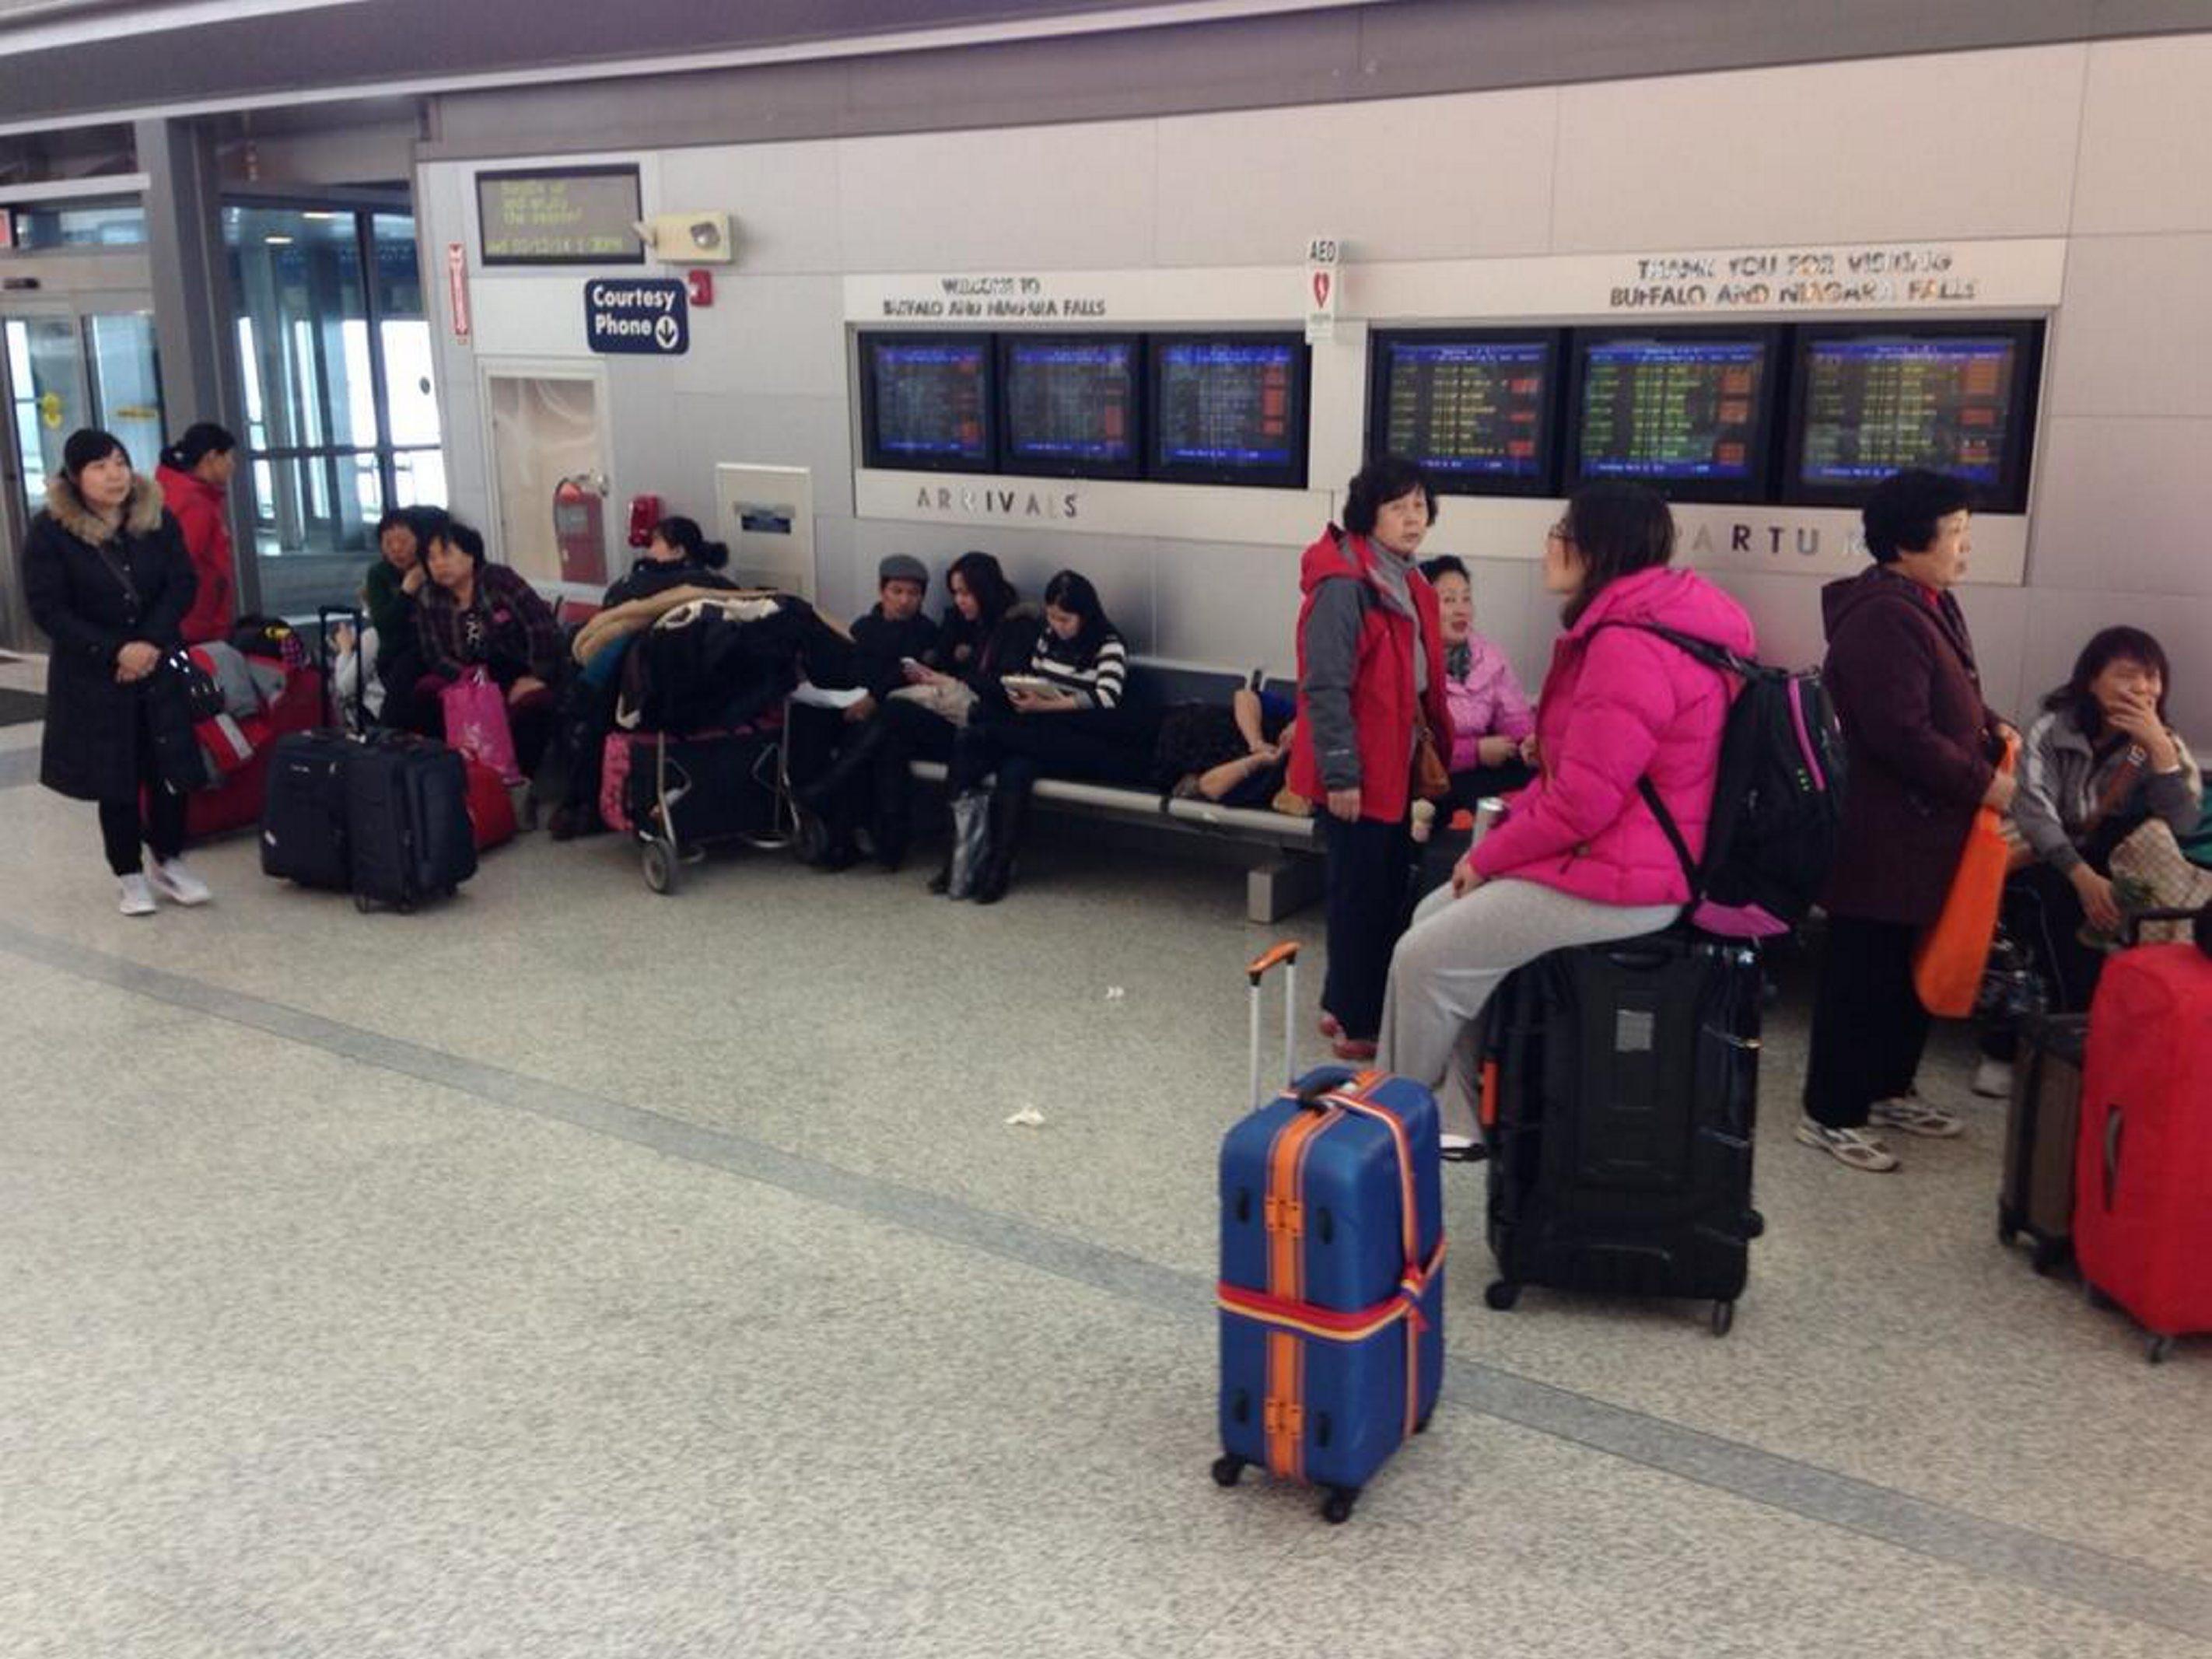 Travelers wait due to flight delays and cancellations at Buffalo Niagara International Airport in Cheektowaga. (Charles Lewis/Buffalo News)